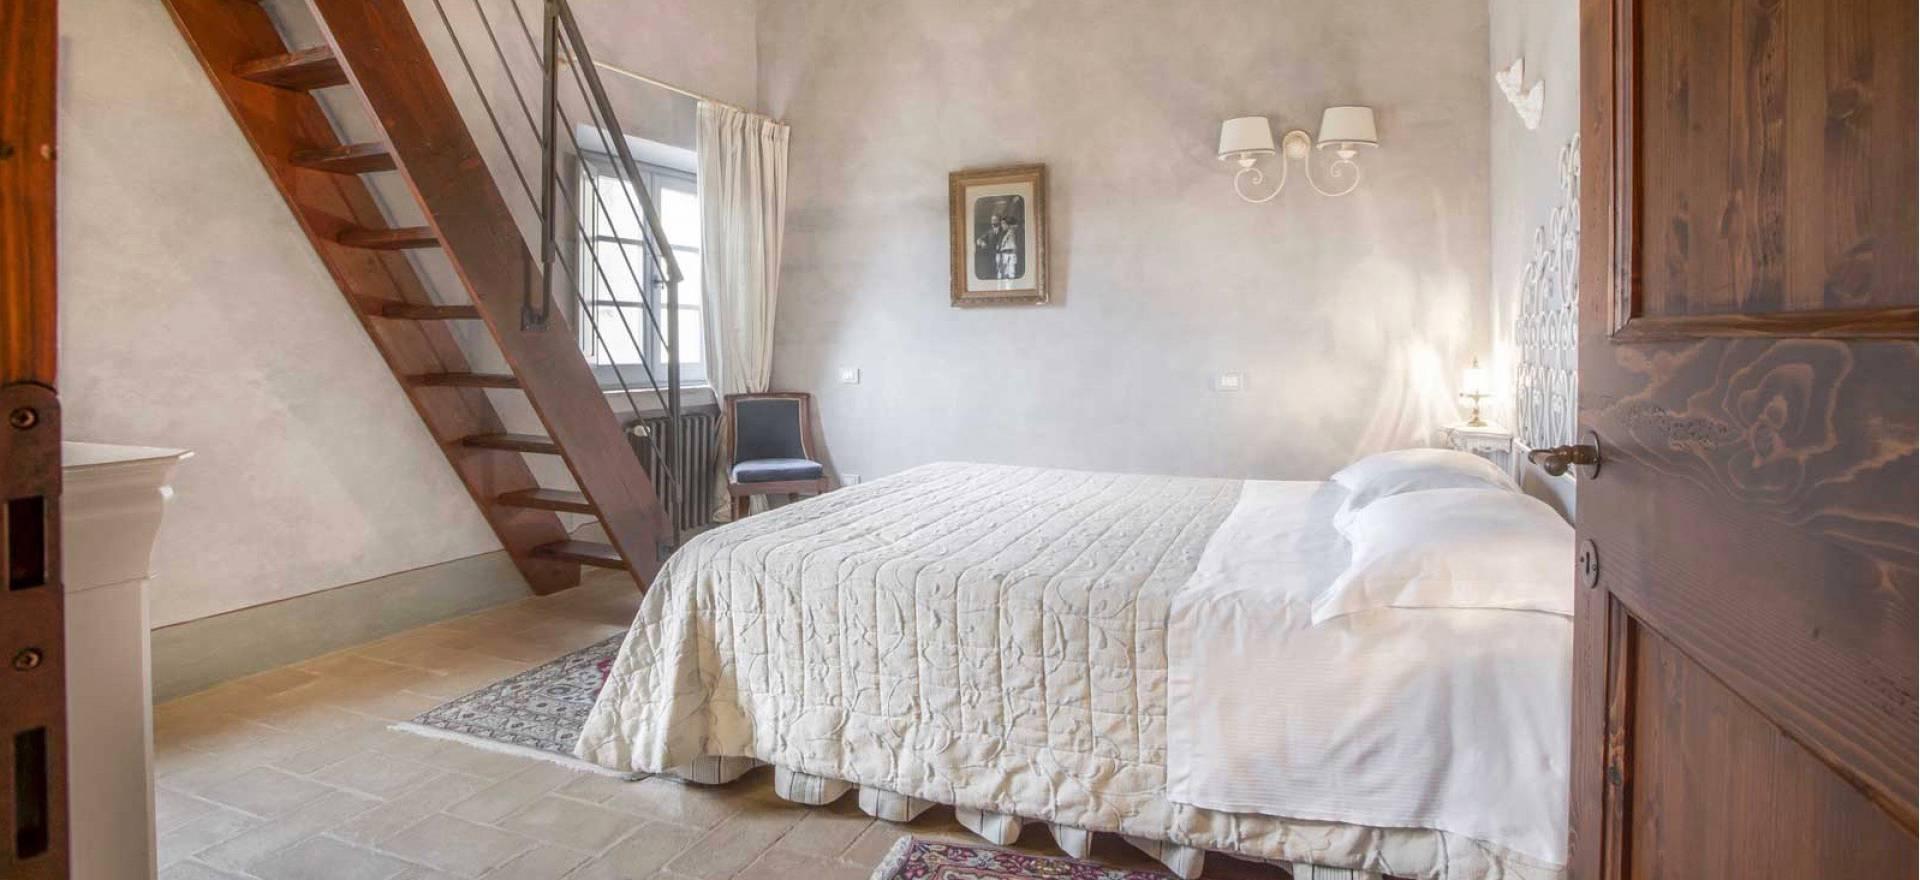 Agriturismo Toscana Agriturismo romantico con vista su San Gimignano